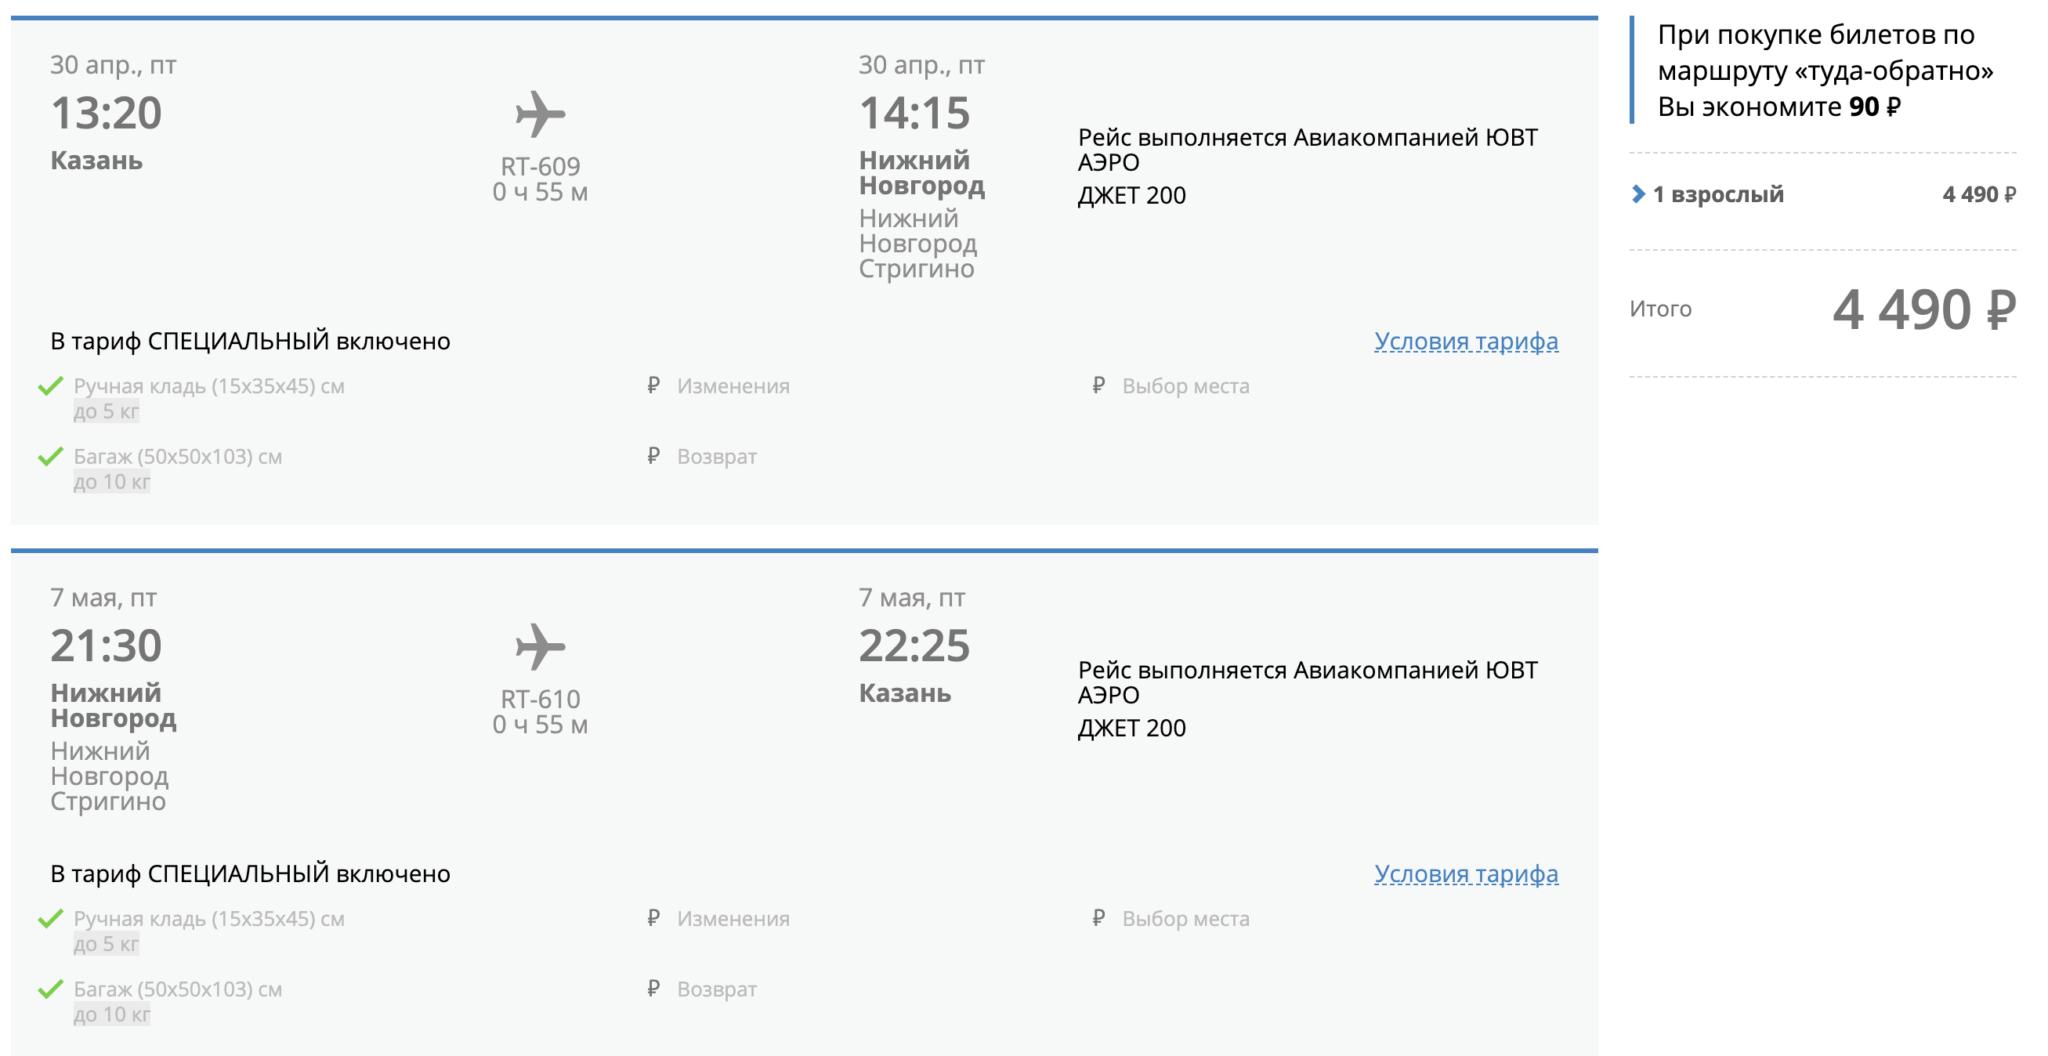 UVT Aero: летим из Казани в Самару, Нижний Новгород и Ярославль за 3100₽/4500₽/5100₽ туда-обратно